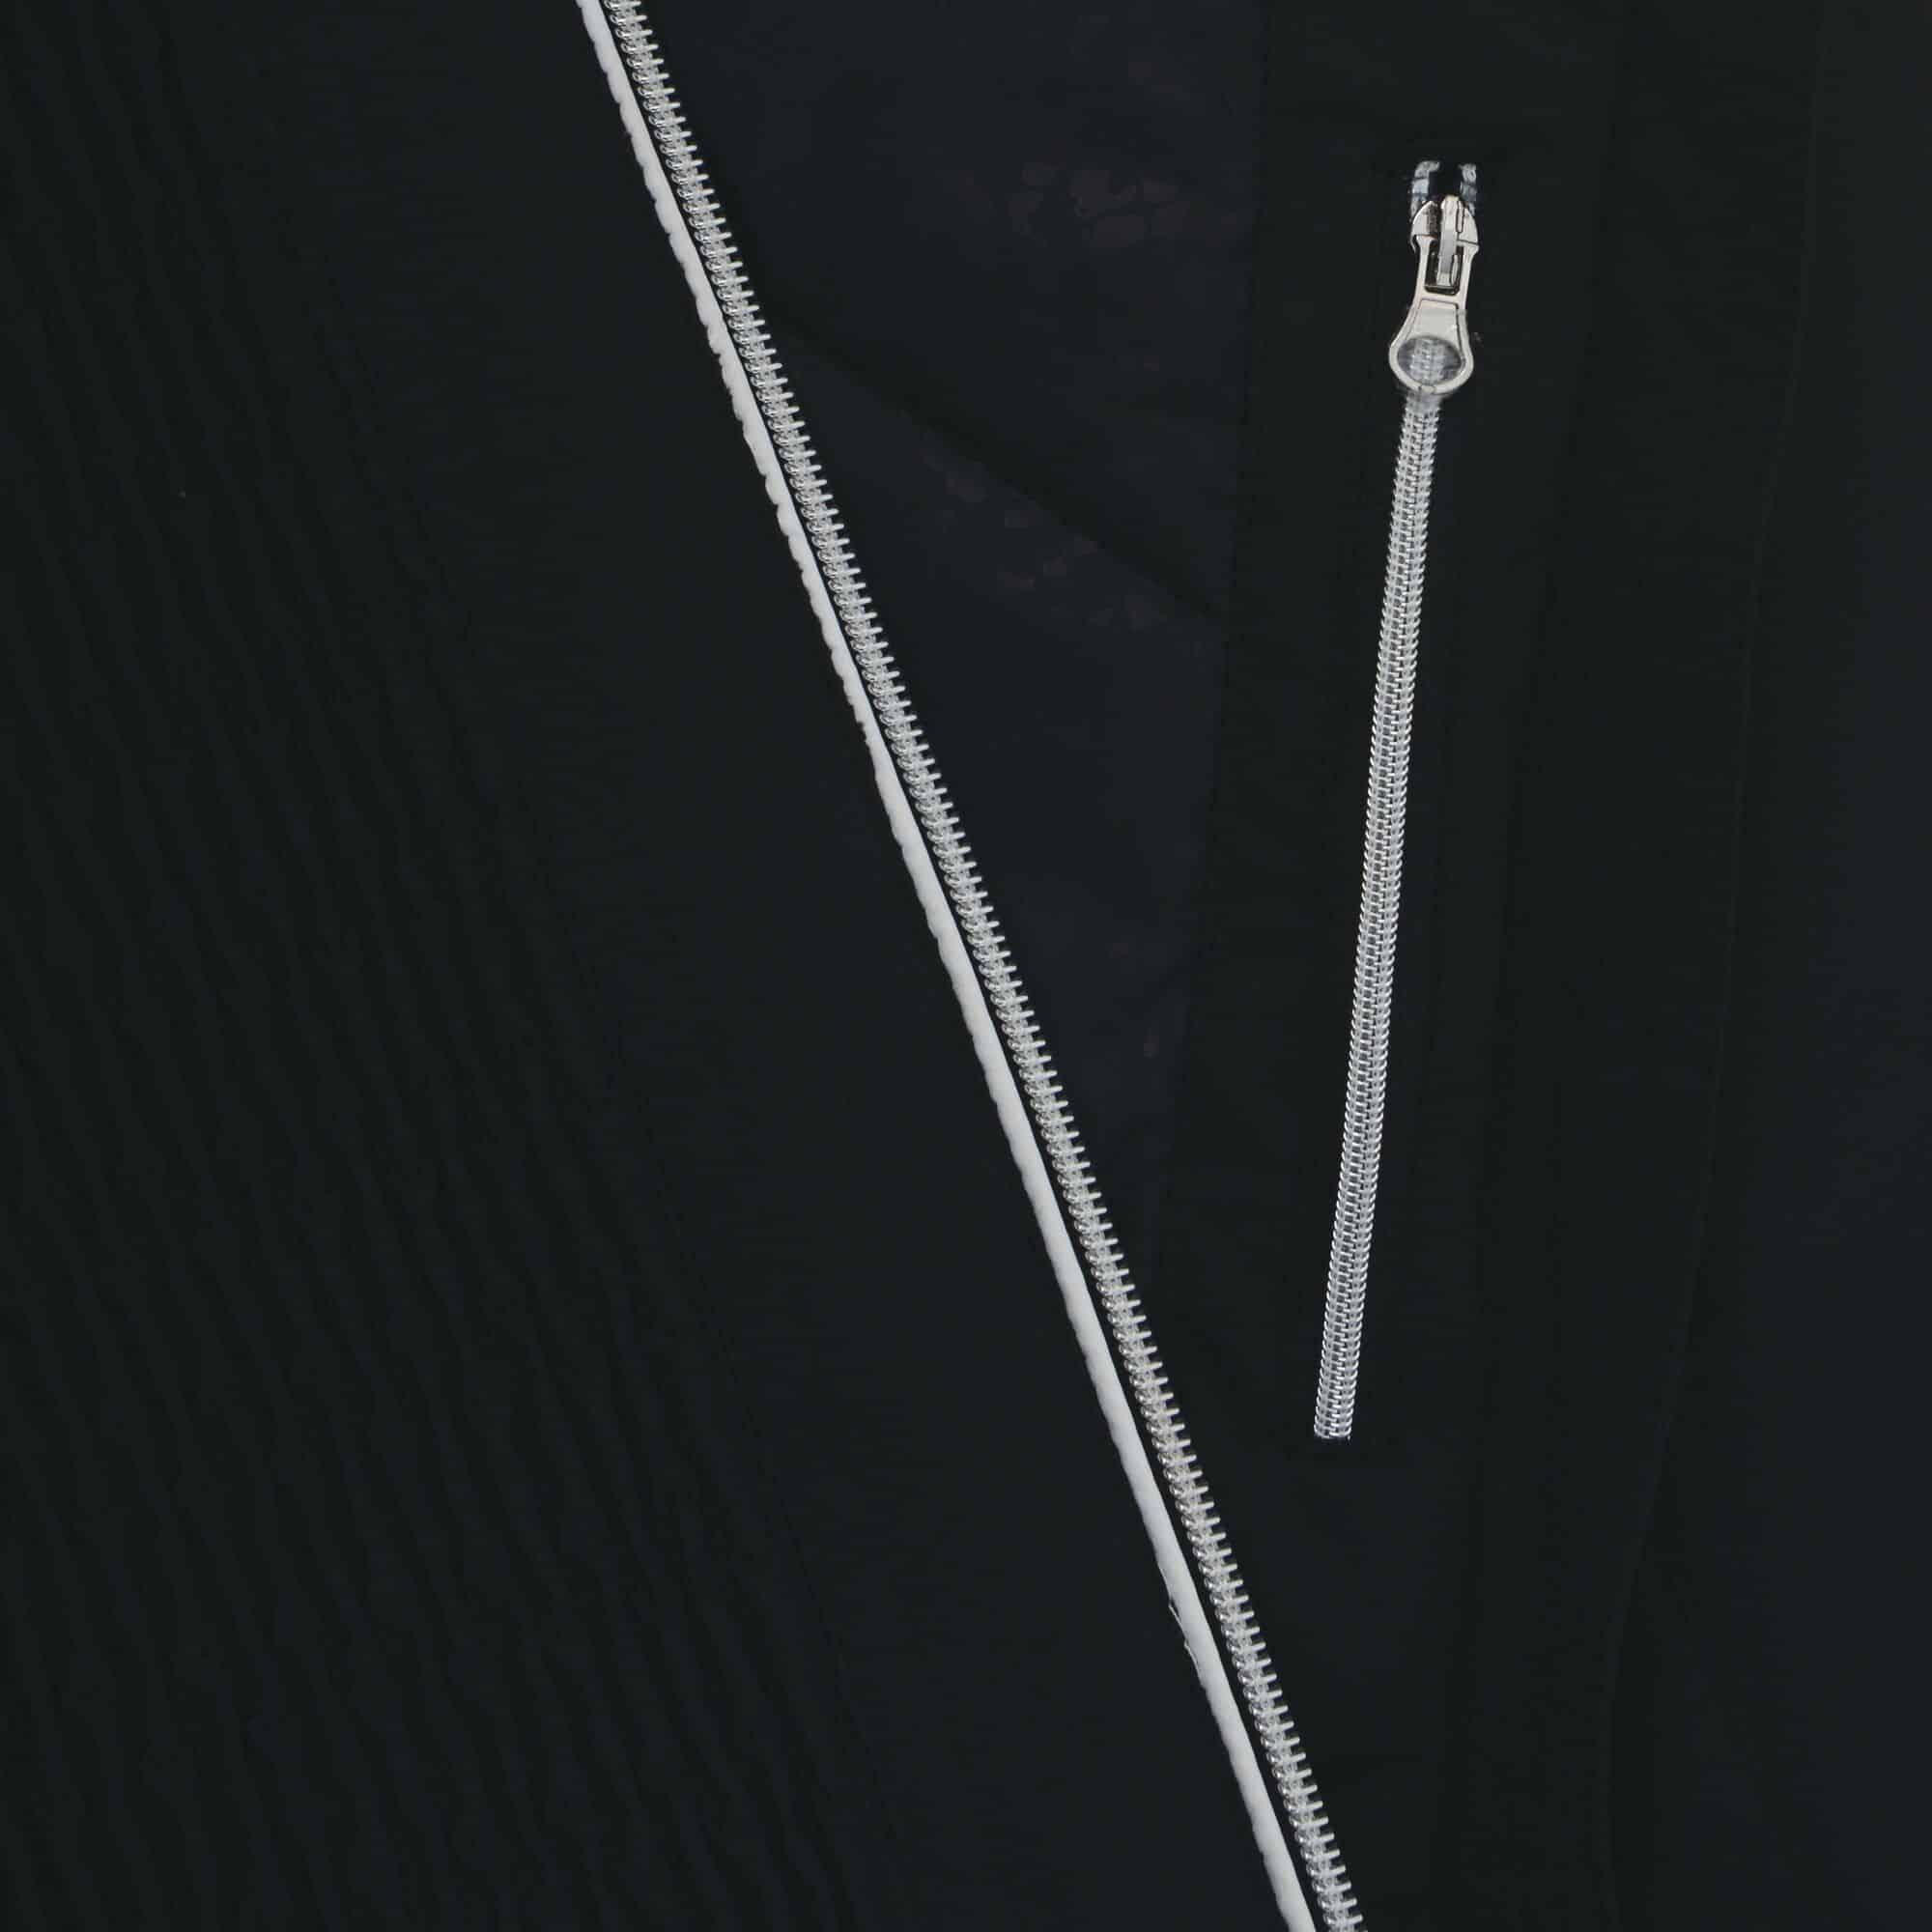 statement black zip